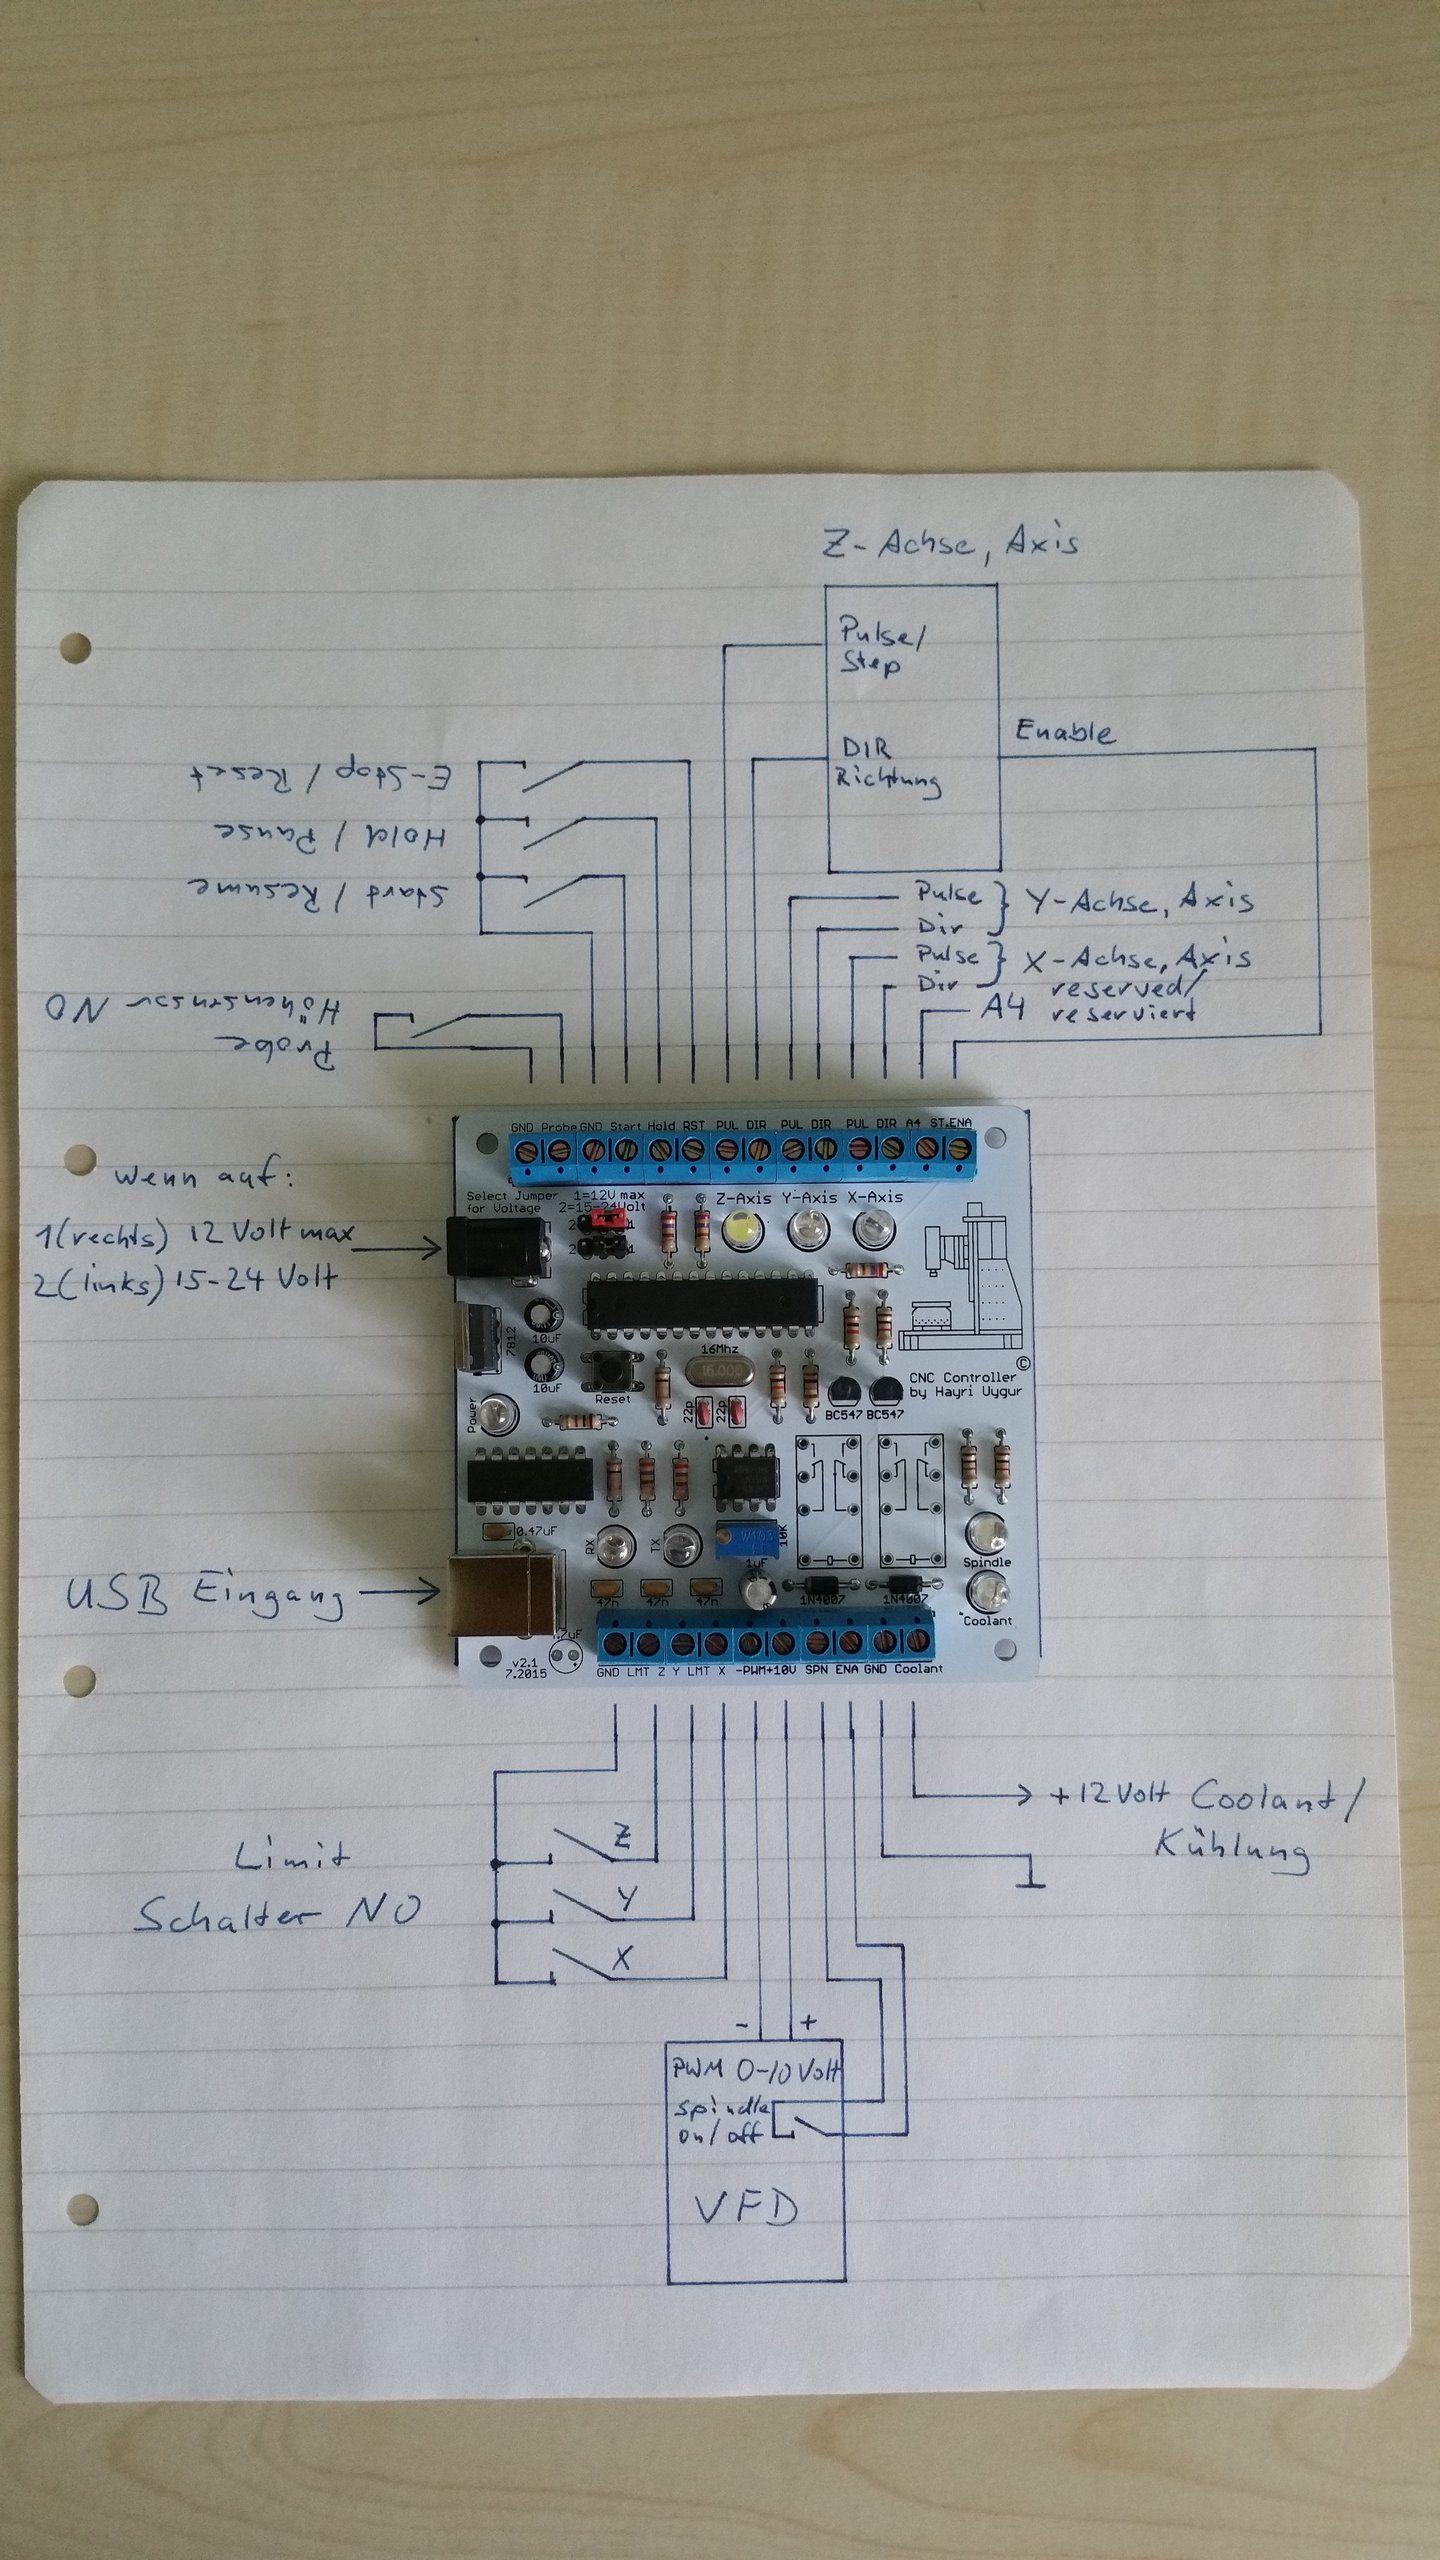 Schema Elettrico Za : Phoenix usb cnc controller with pwm output diy cnc metal